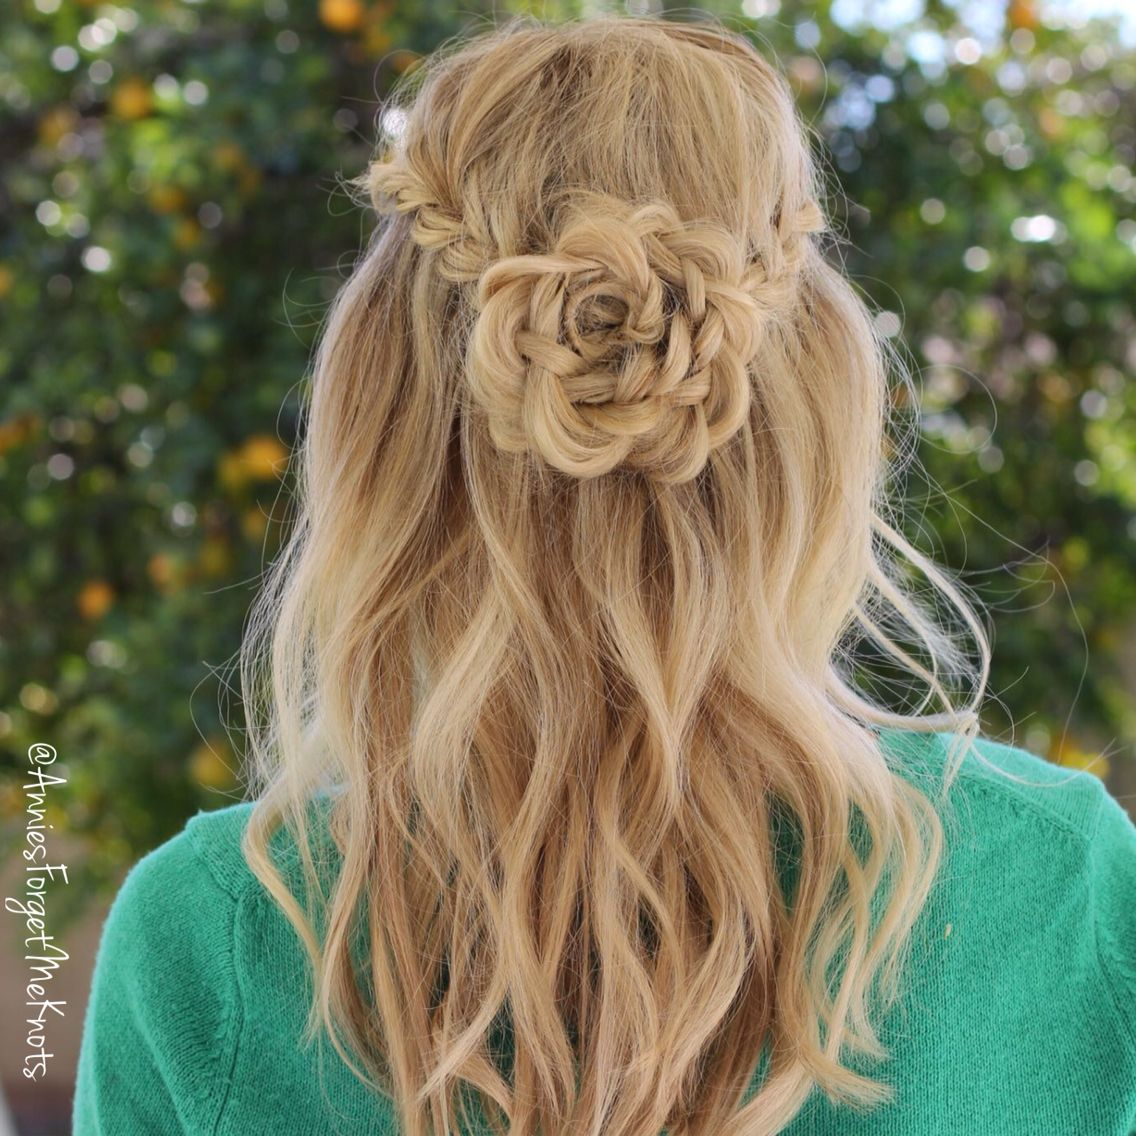 How To Flower Braid Hair Styles Hair Styles 2016 Hairstyle